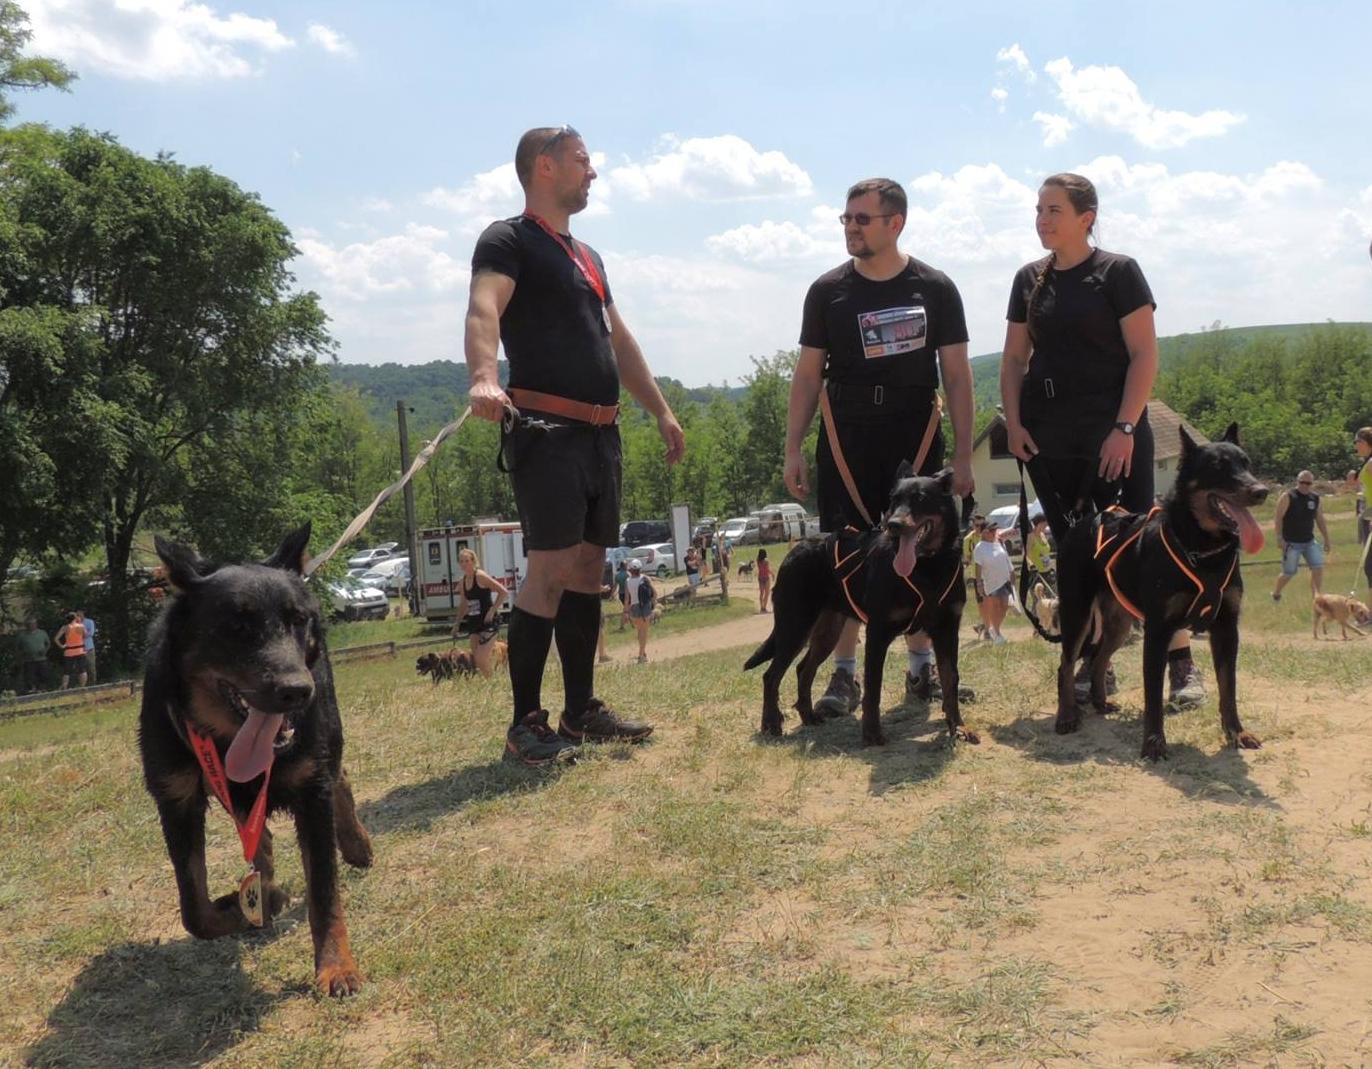 beauceron-berger-de-beauce-bas-rouge-gardiens-du-chaos-kennel-hard-dog-race-finishers-dog-sport-working-dogs_1.jpg